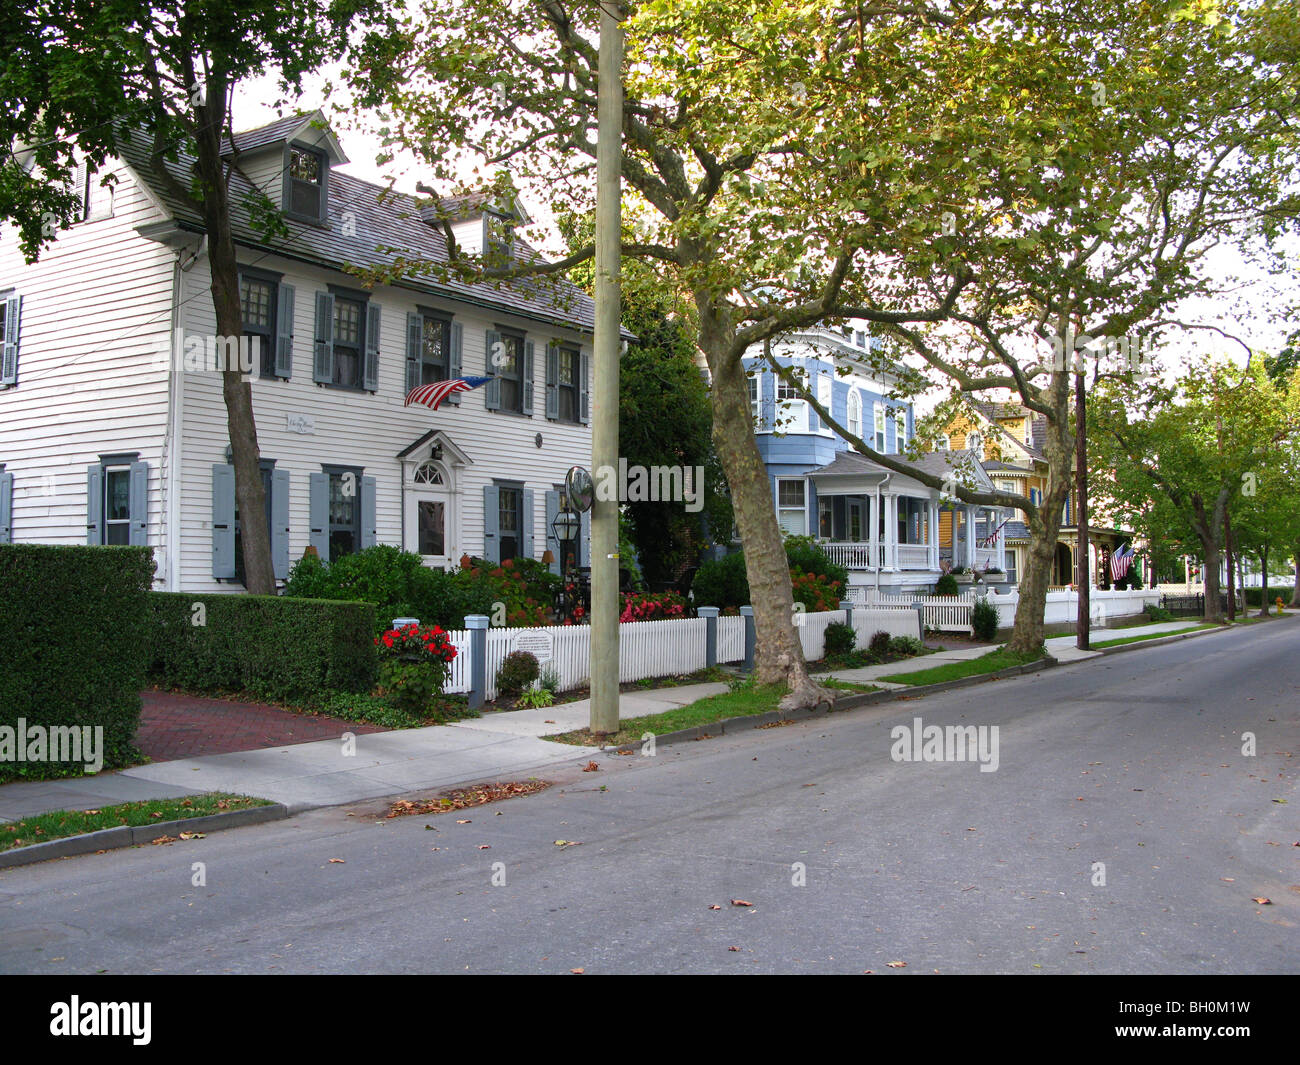 N J Stock Photos & N J Stock Images - Alamy